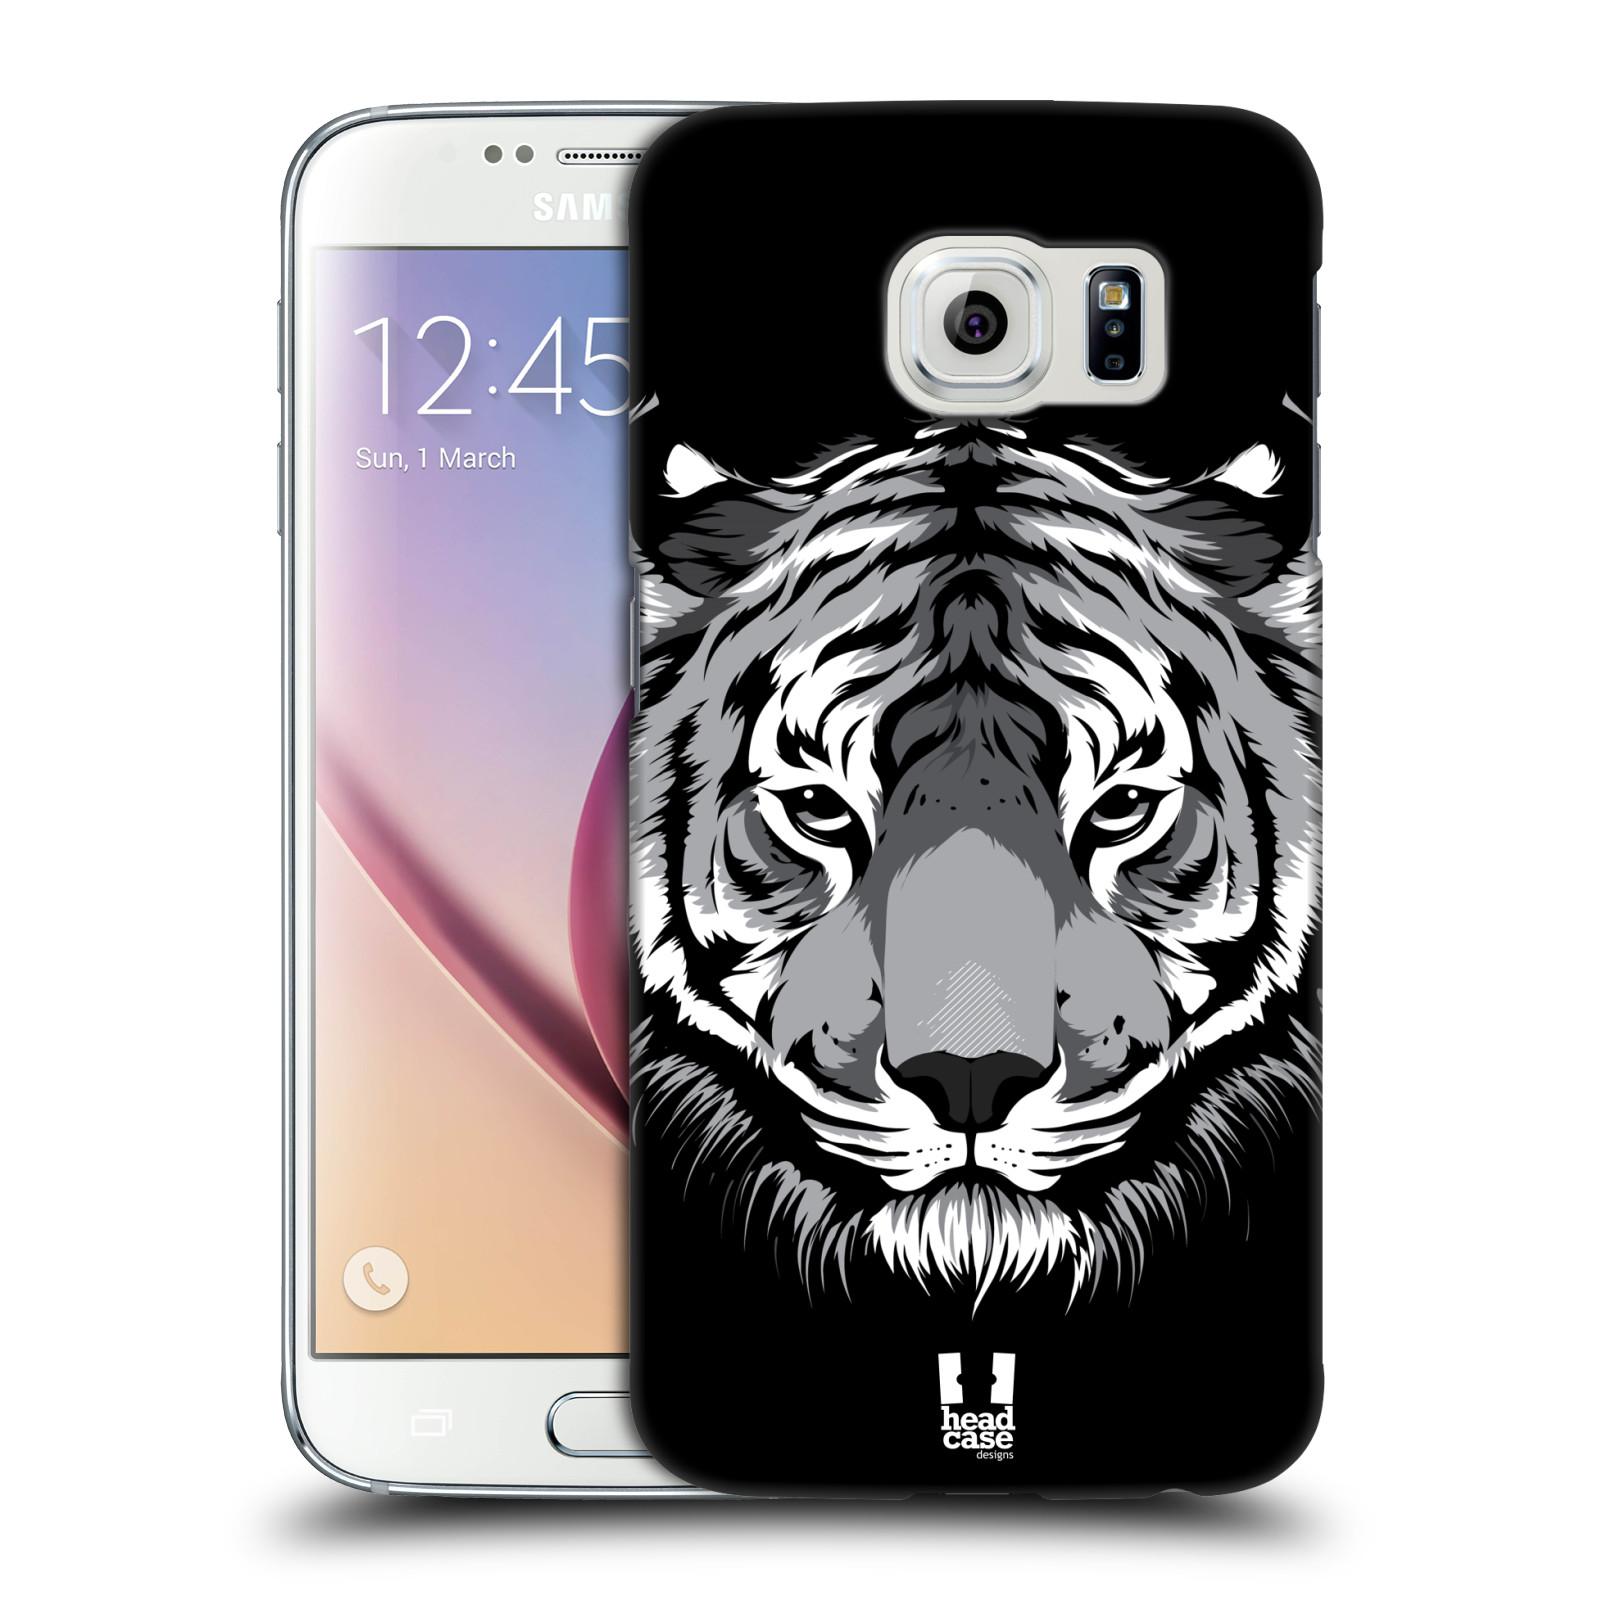 HEAD CASE plastový obal na mobil SAMSUNG Galaxy S6 (G9200, G920F) vzor Zvíře kreslená tvář 2 tygr